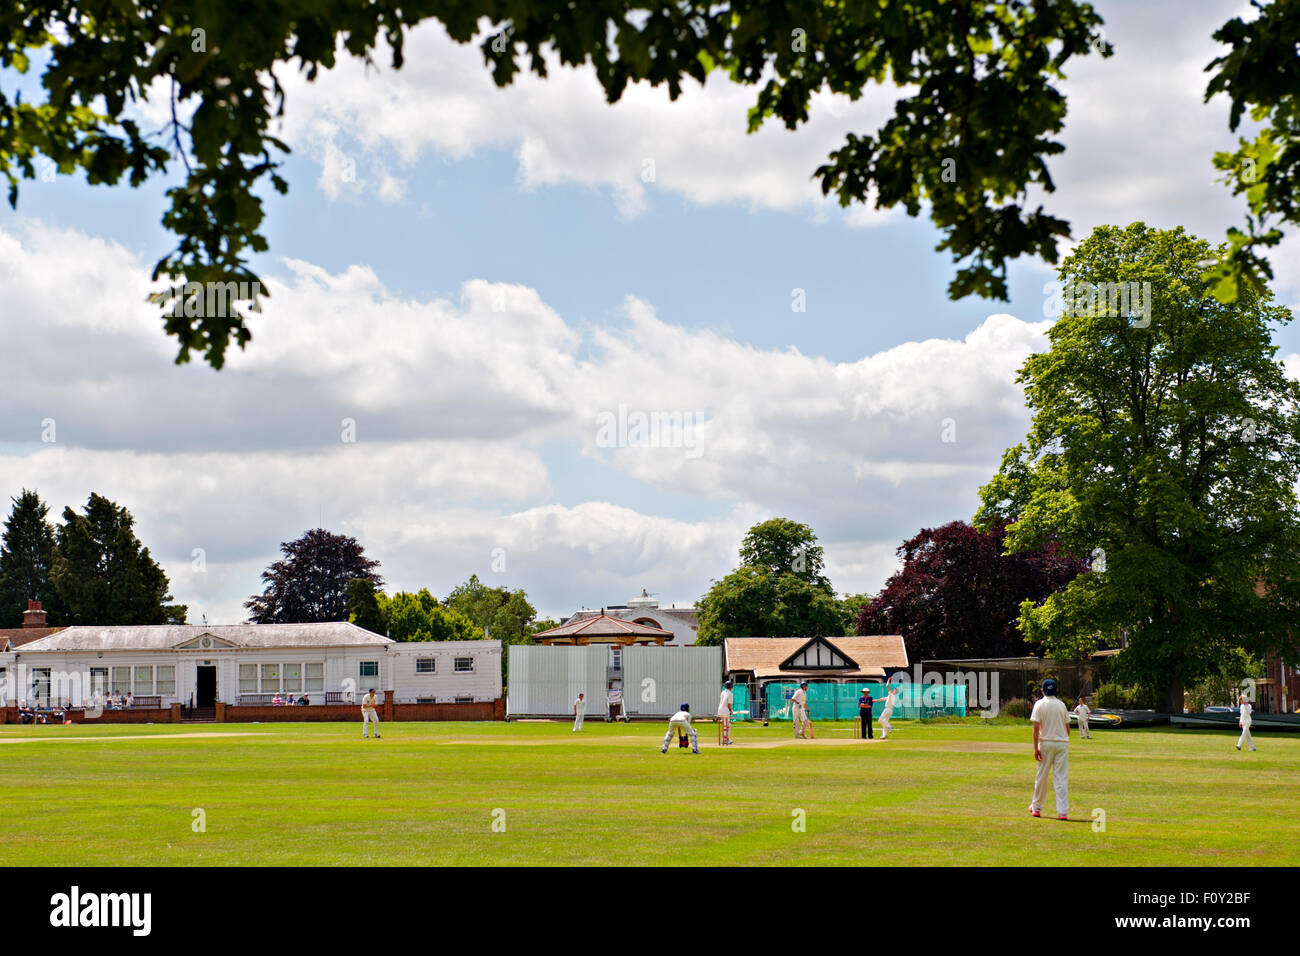 A cricket match in progress at the famous Vine cricket ground in Sevenoaks, Kent, UK Stock Photo